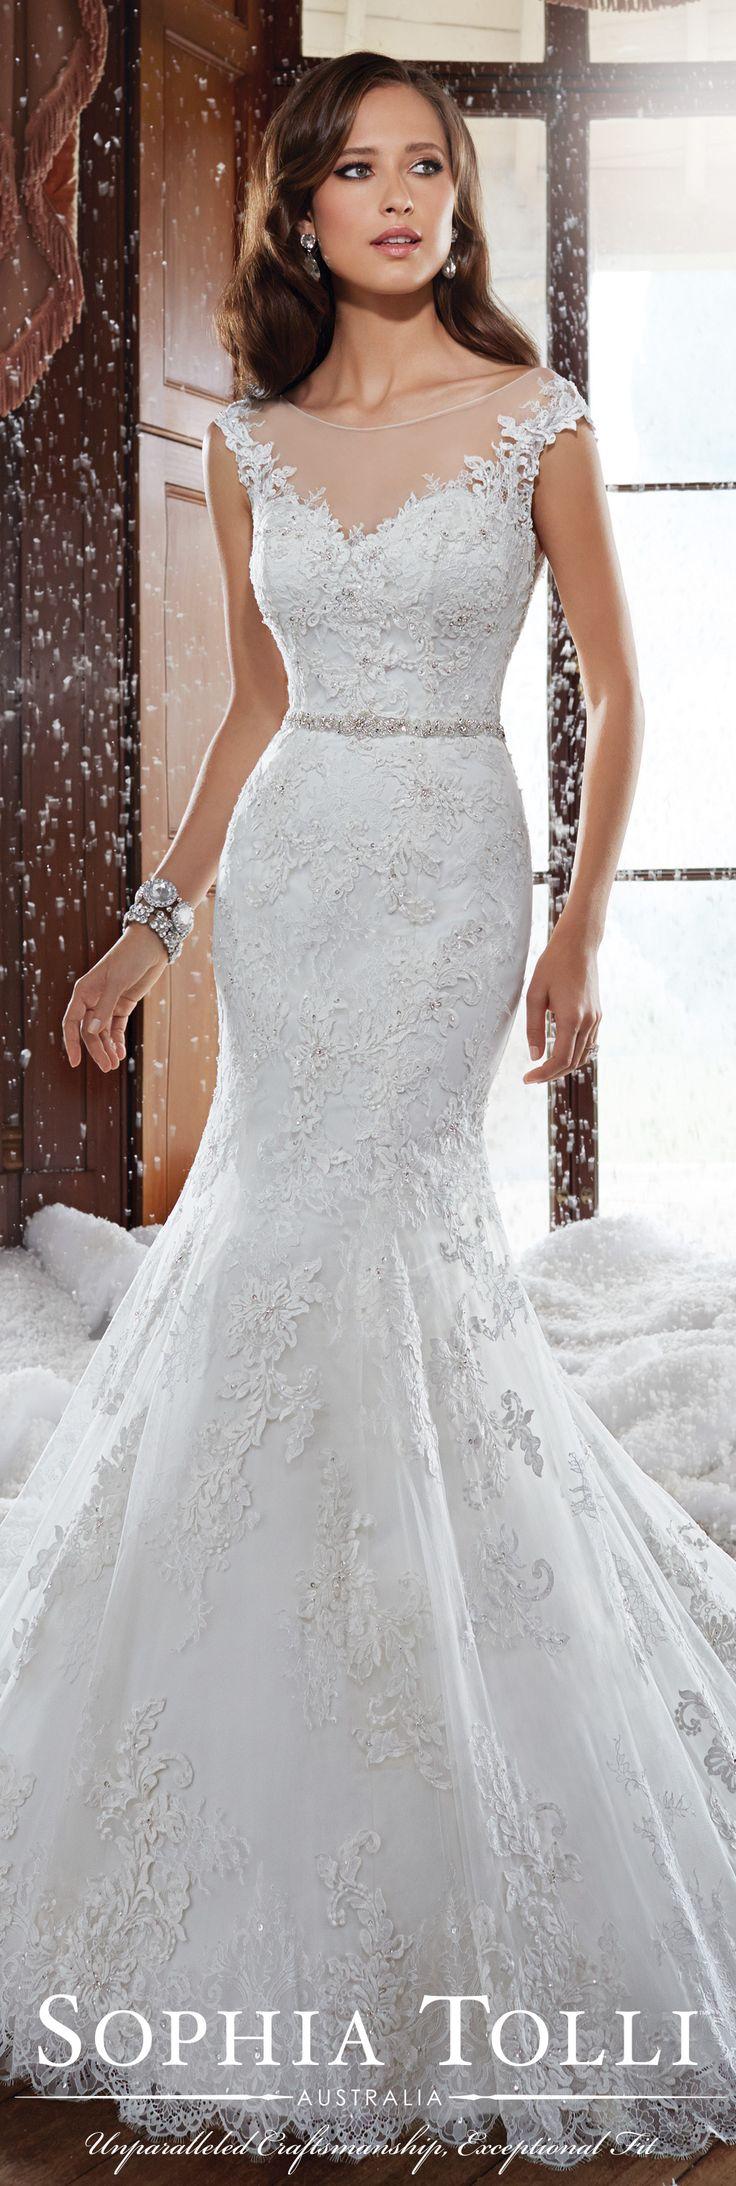 The Sophia Tolli Fall 2015 Wedding Dress Collection - Style No. Y21512 sophiatolli.com #laceweddingdress